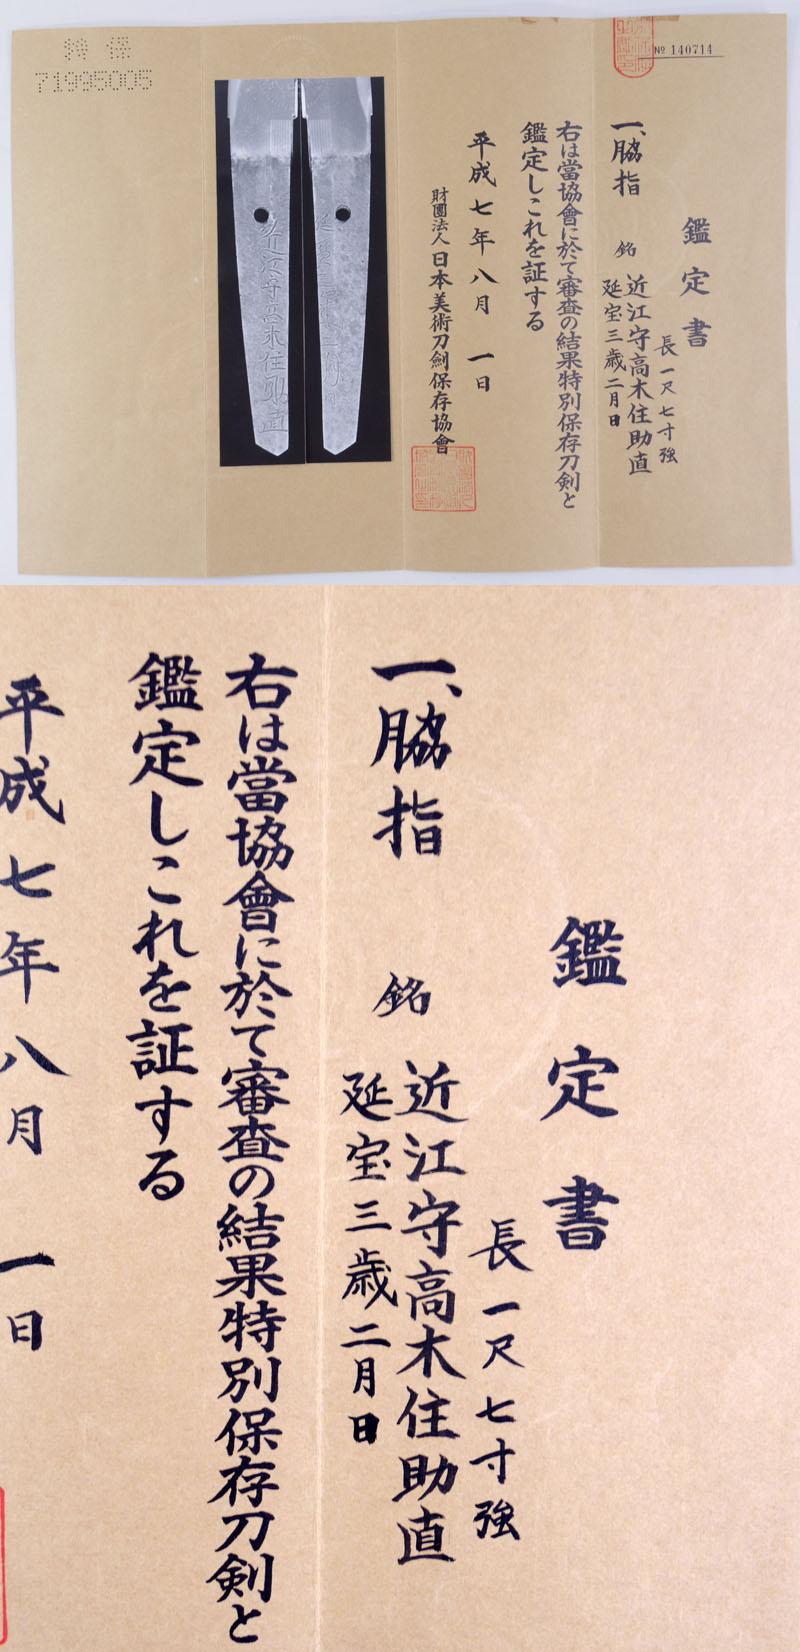 近江守高木住助直 Picture of Certificate